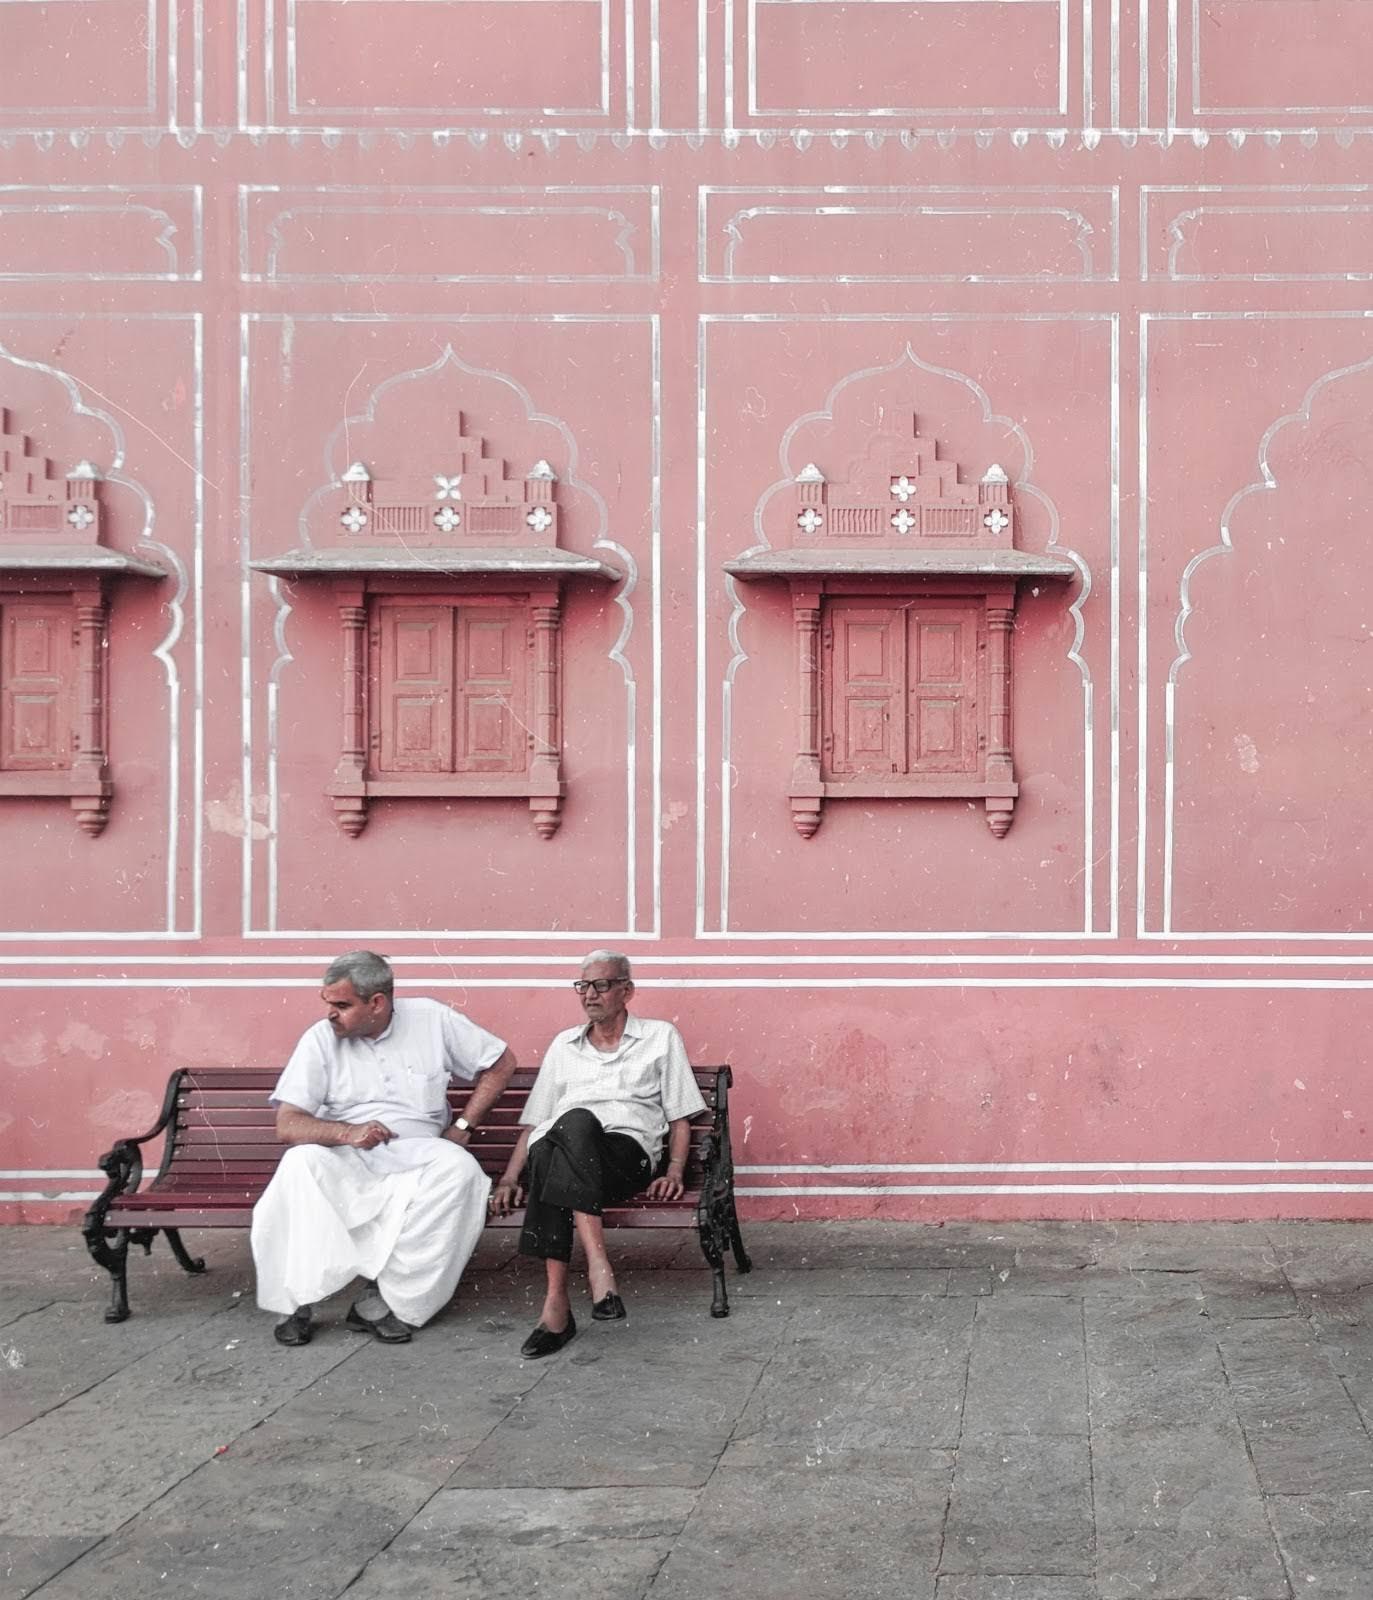 Old men sitting in pink city